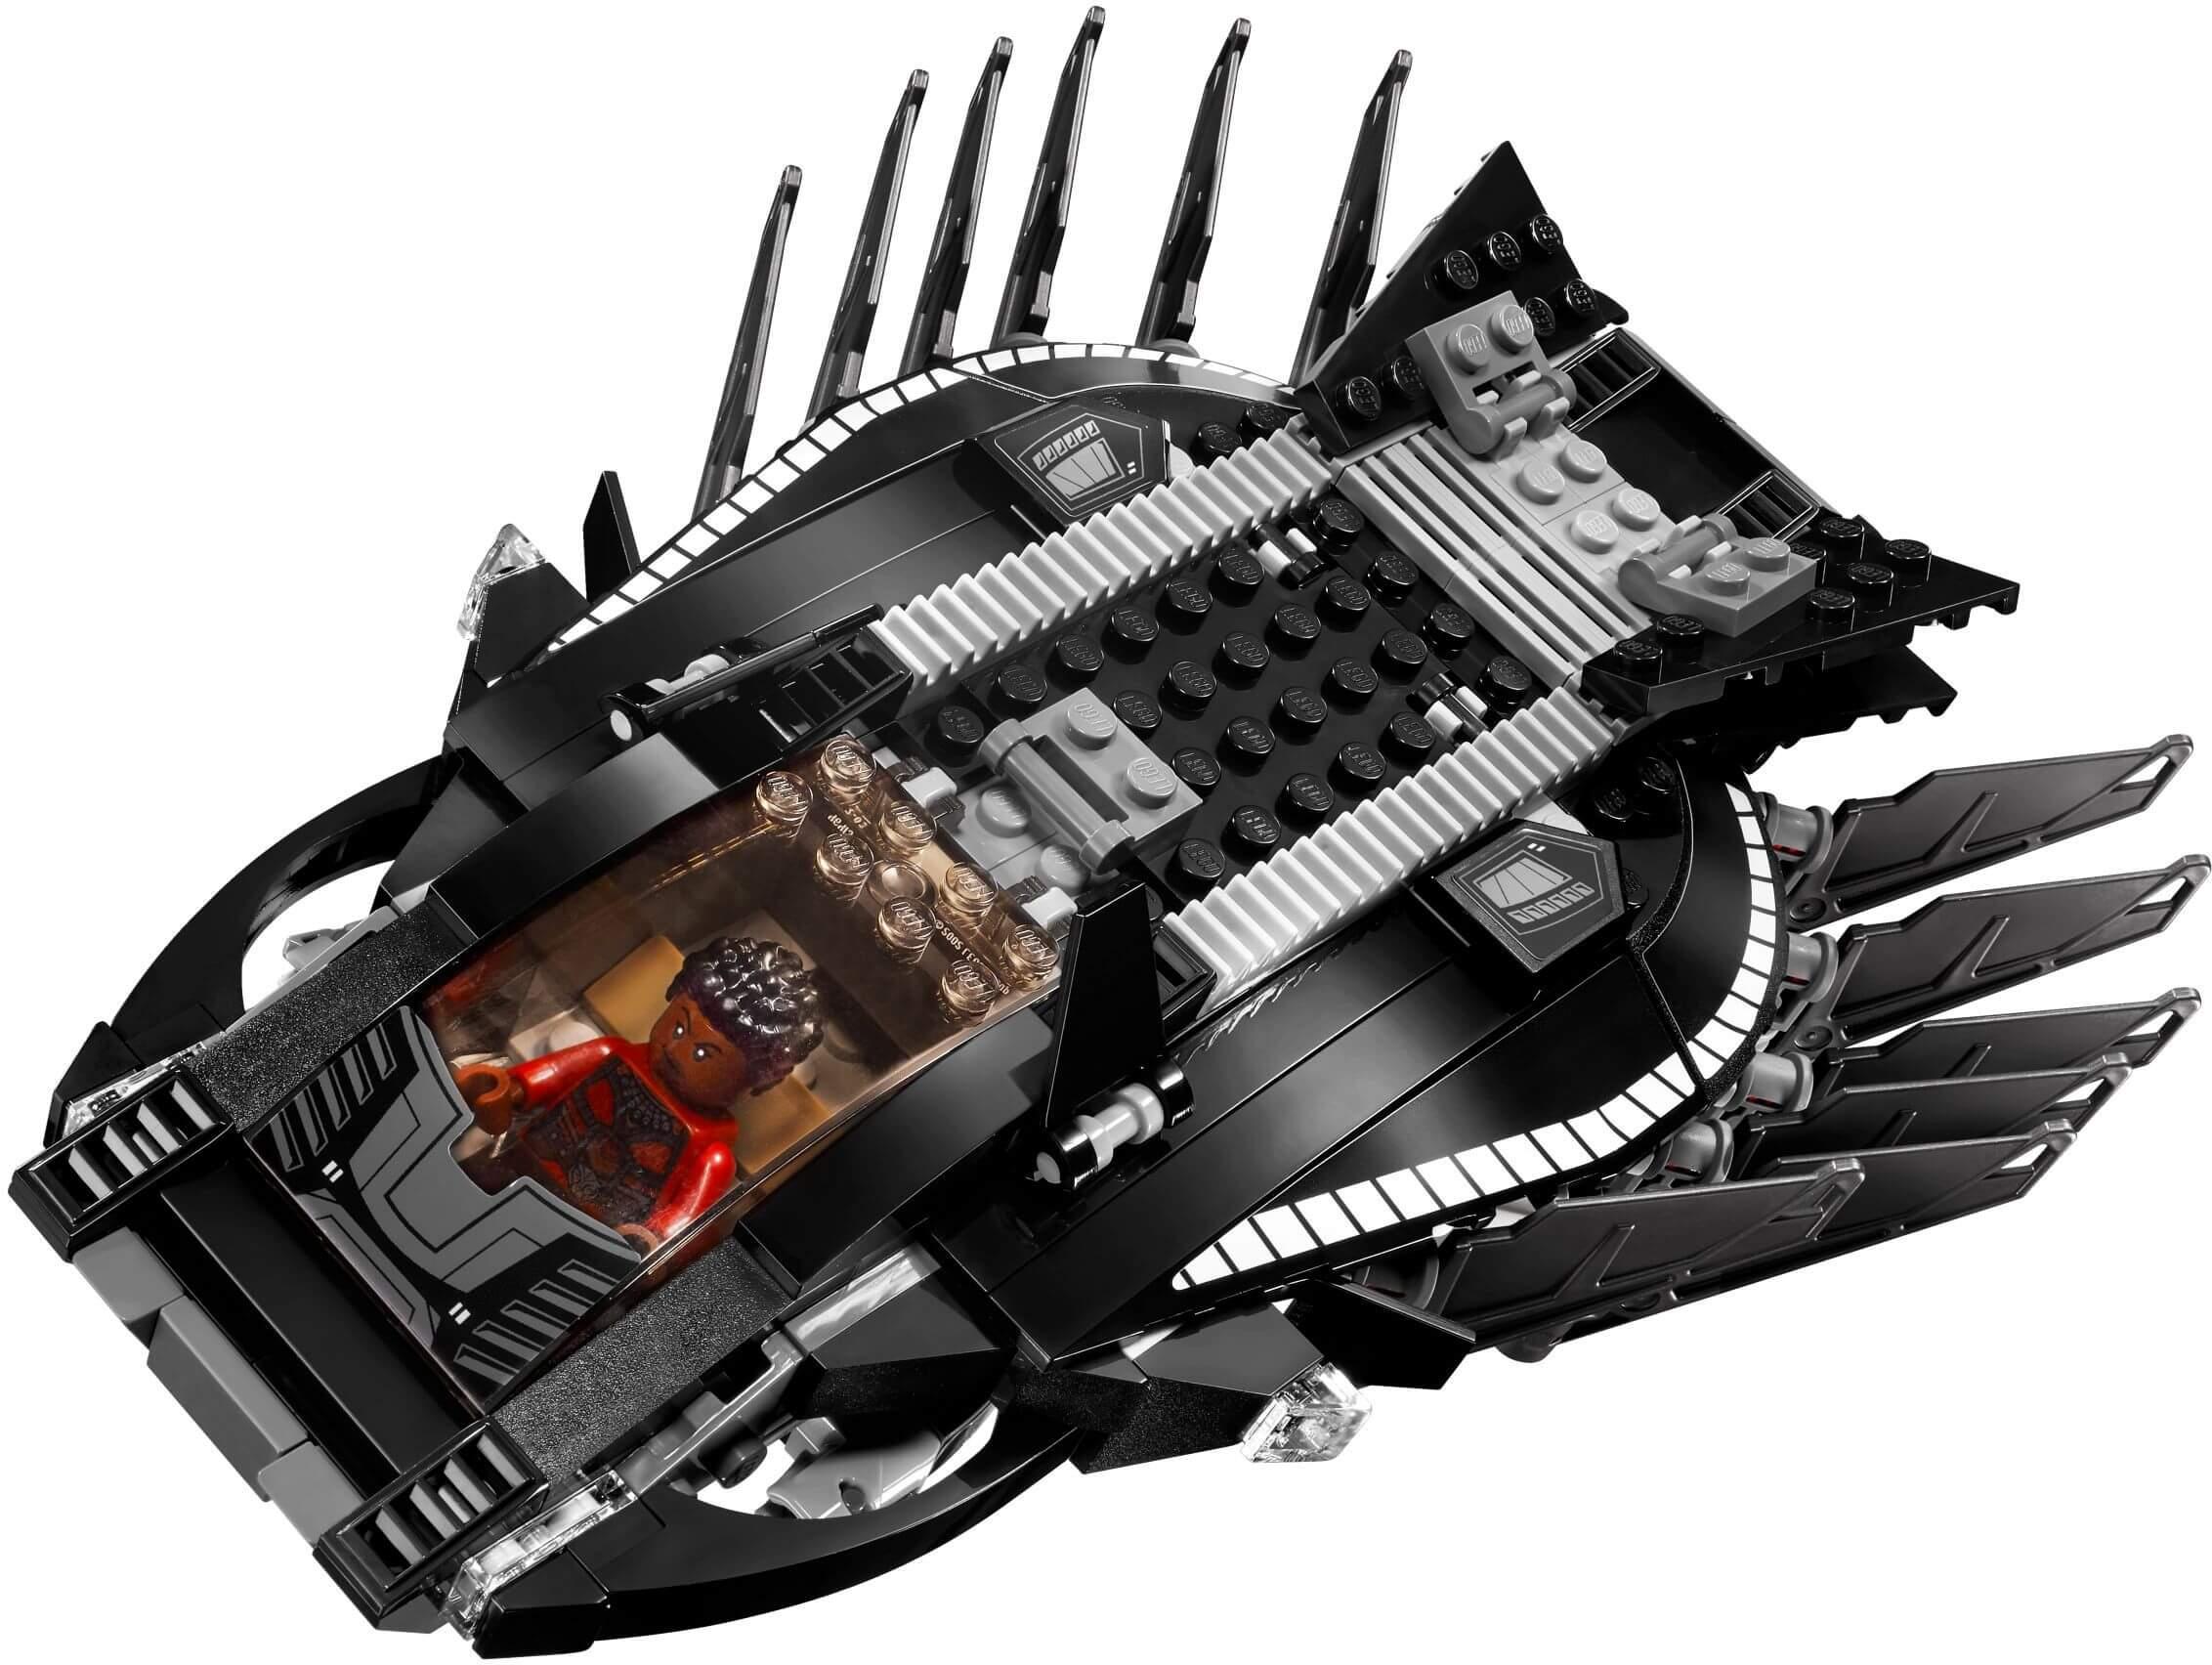 Mua đồ chơi LEGO 76100 - LEGO Marvel Super Heroes 76100 - Phi Thuyền Báo Đen (LEGO Marvel Super Heroes 76100 Royal Talon Fighter Attack)